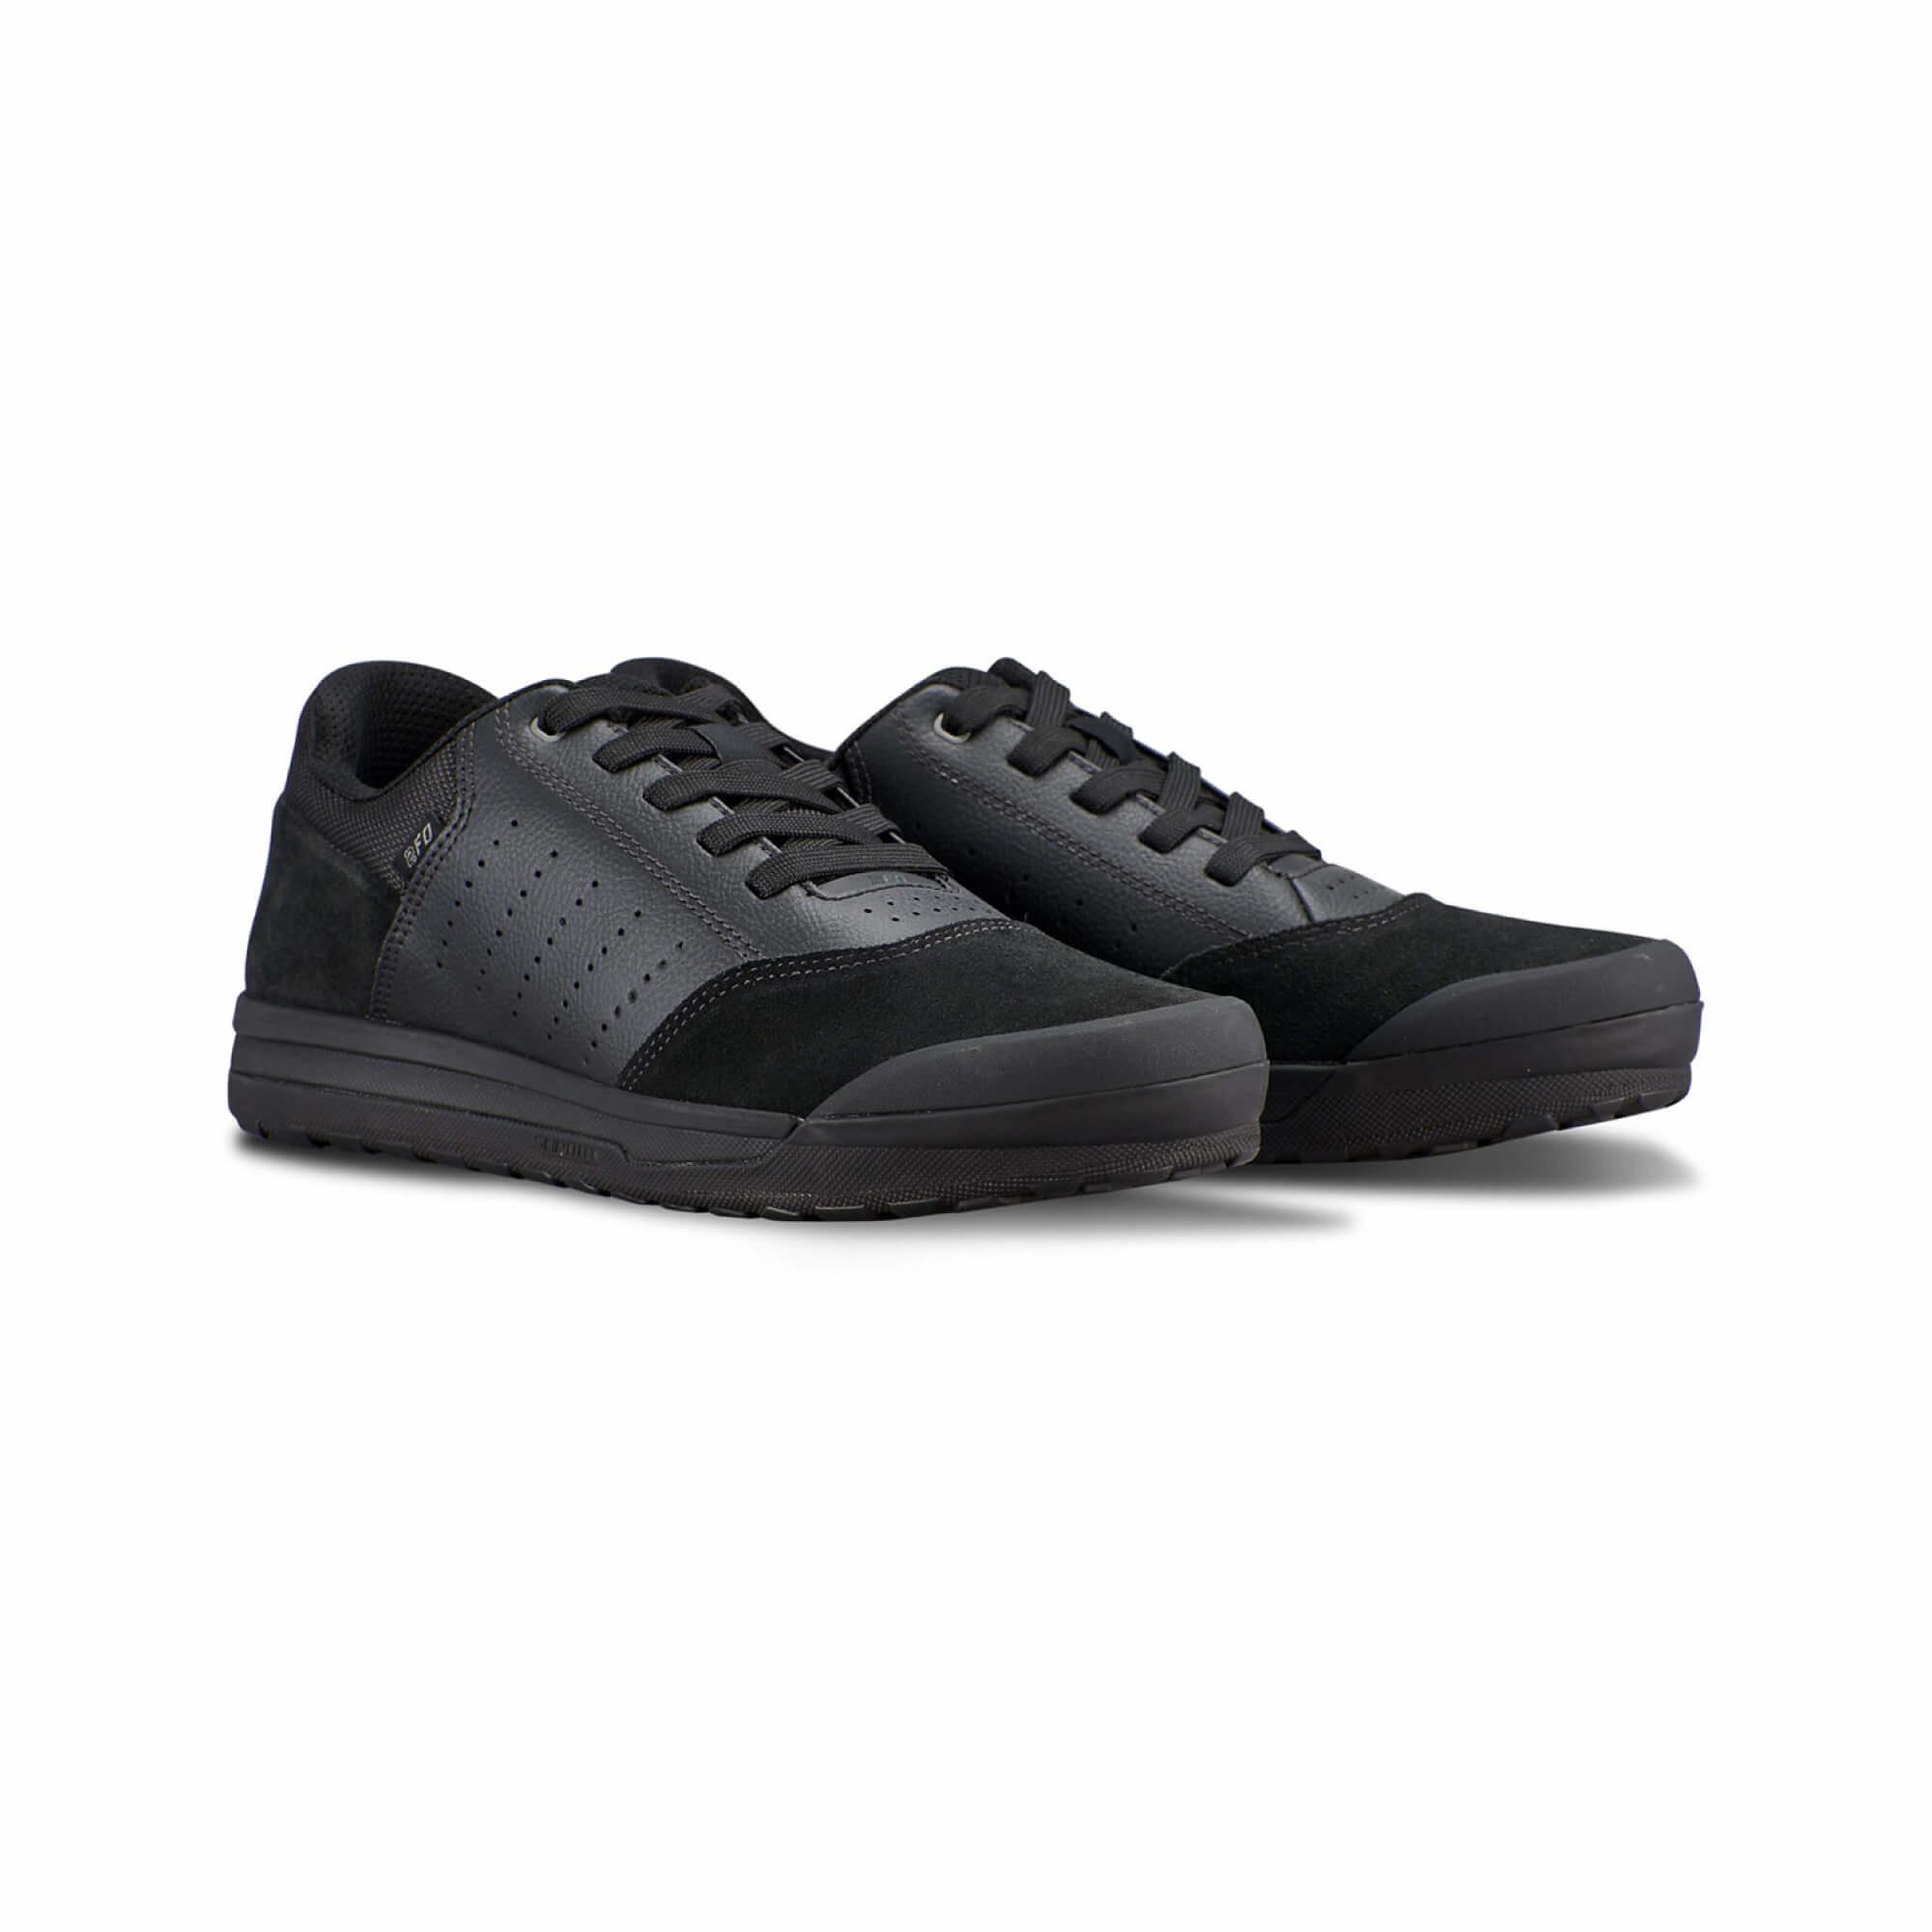 2FO Roost Flat MTB Shoe-6